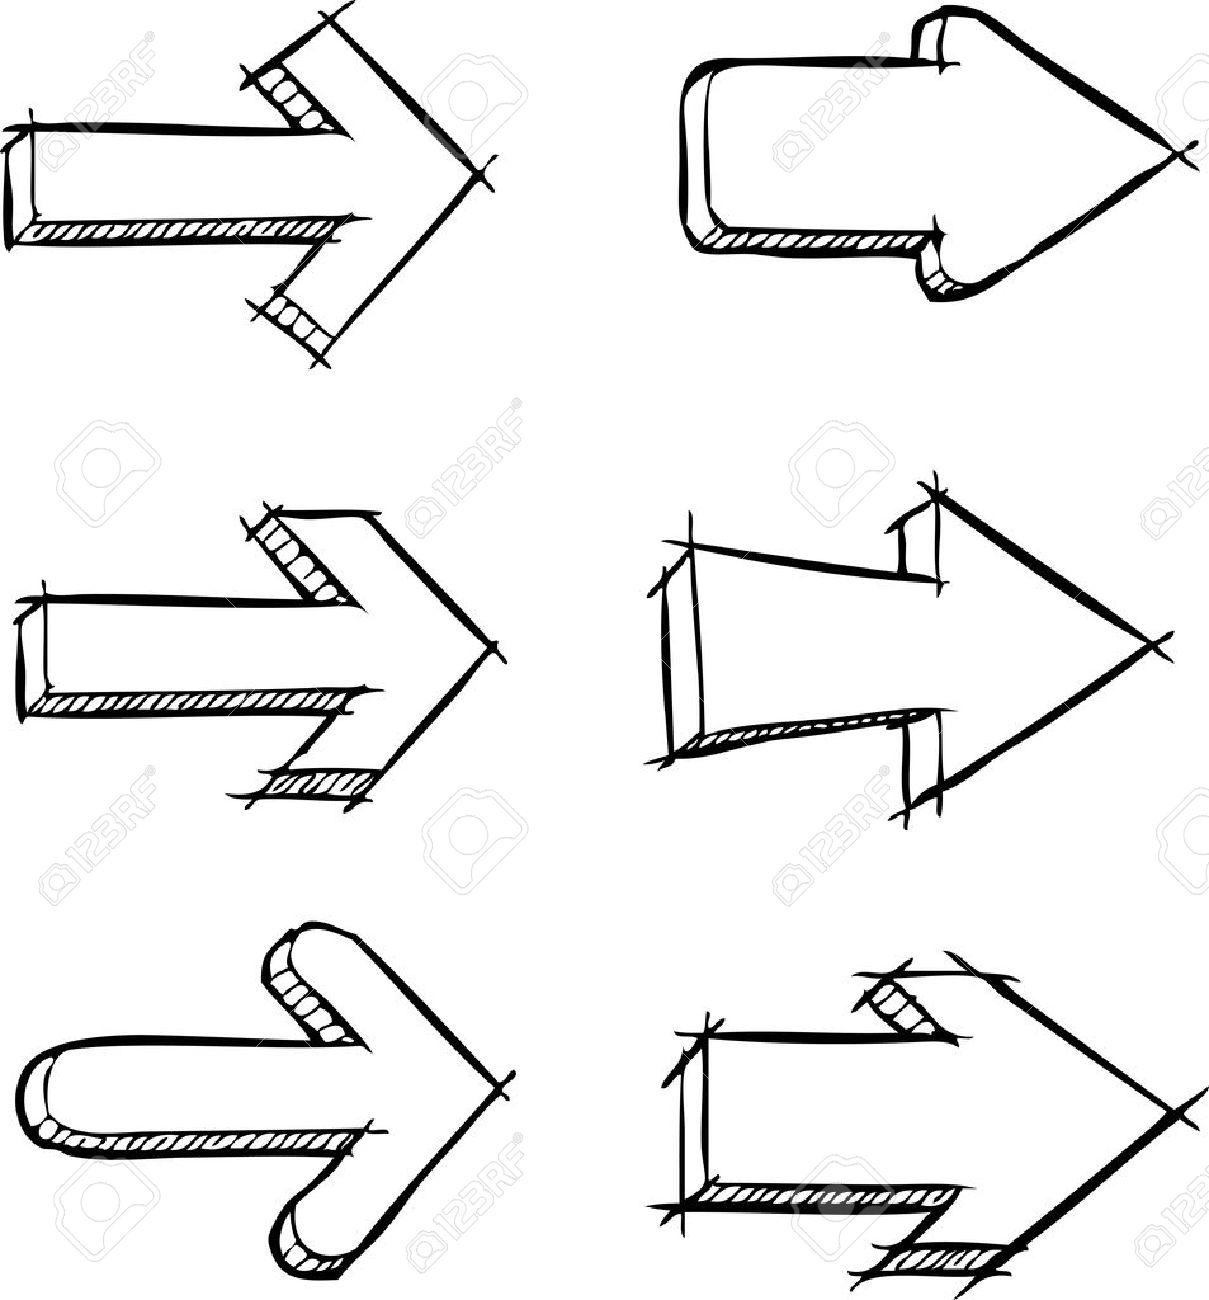 A set of arrows drawn vector illustration - 21531711